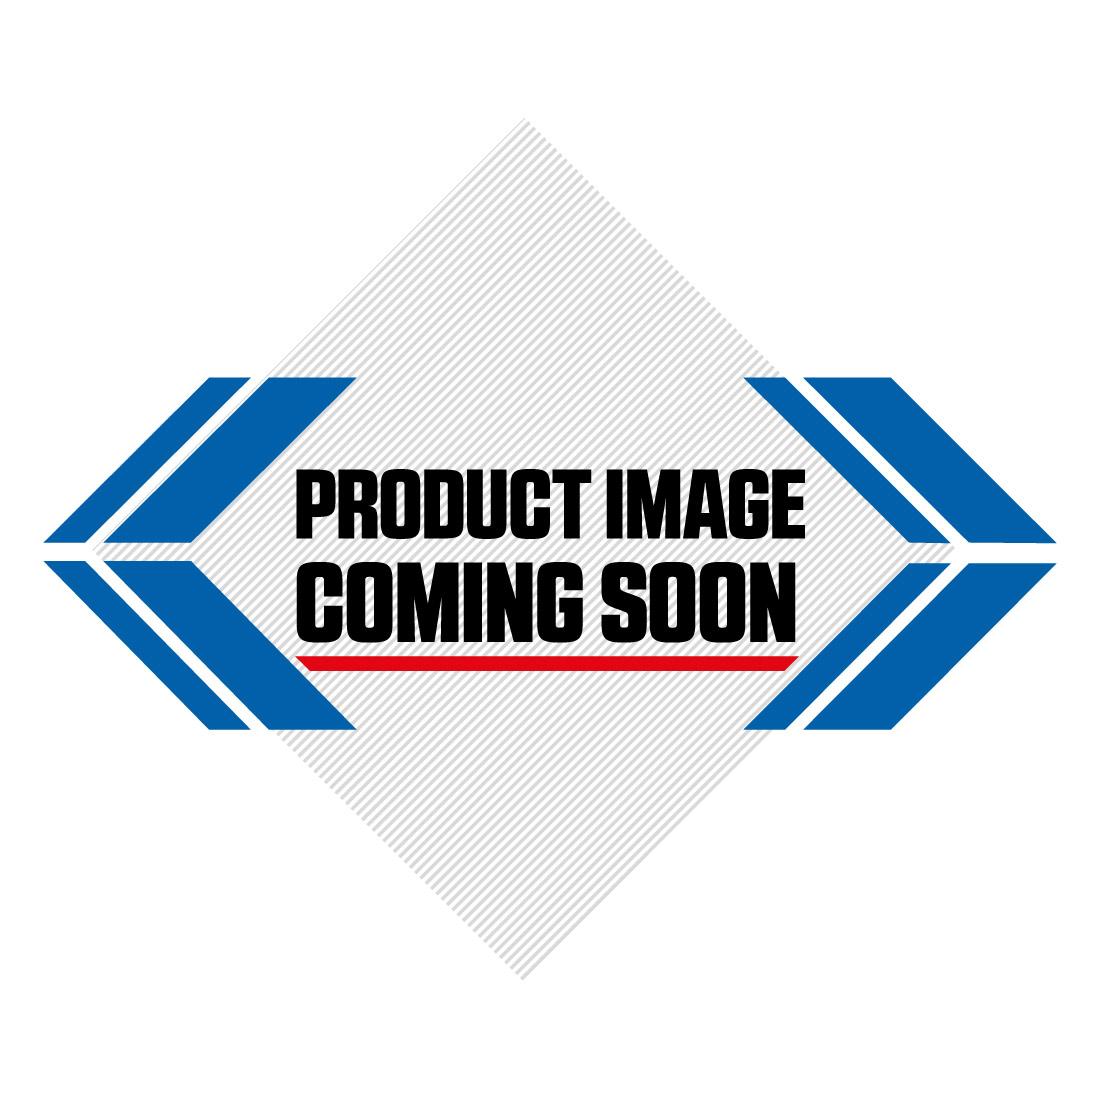 Renthal Twinring Rear Sprocket KTM SX SX-F EXC EXC-F Husqvarna TC FC TE FE - Orange Image-4>